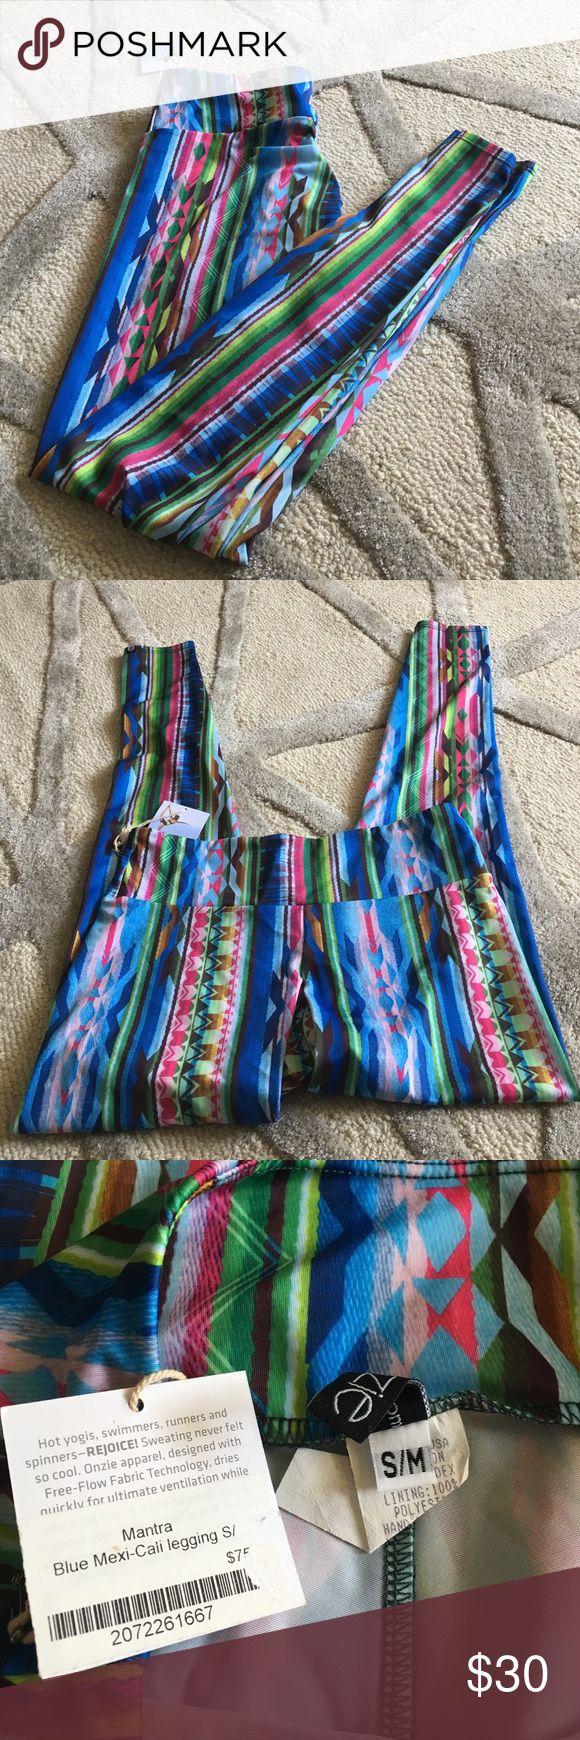 NWT Onzie Tribal Print Yoga Leggings. S/M NWT Onzie Tribal Print Yoga Leggings. S/M. Blue Mexi -Cali legging S/. Tribal print legging. Great for festival season or for a hot yoga class or a coffee date. Onzie Pants Leggings